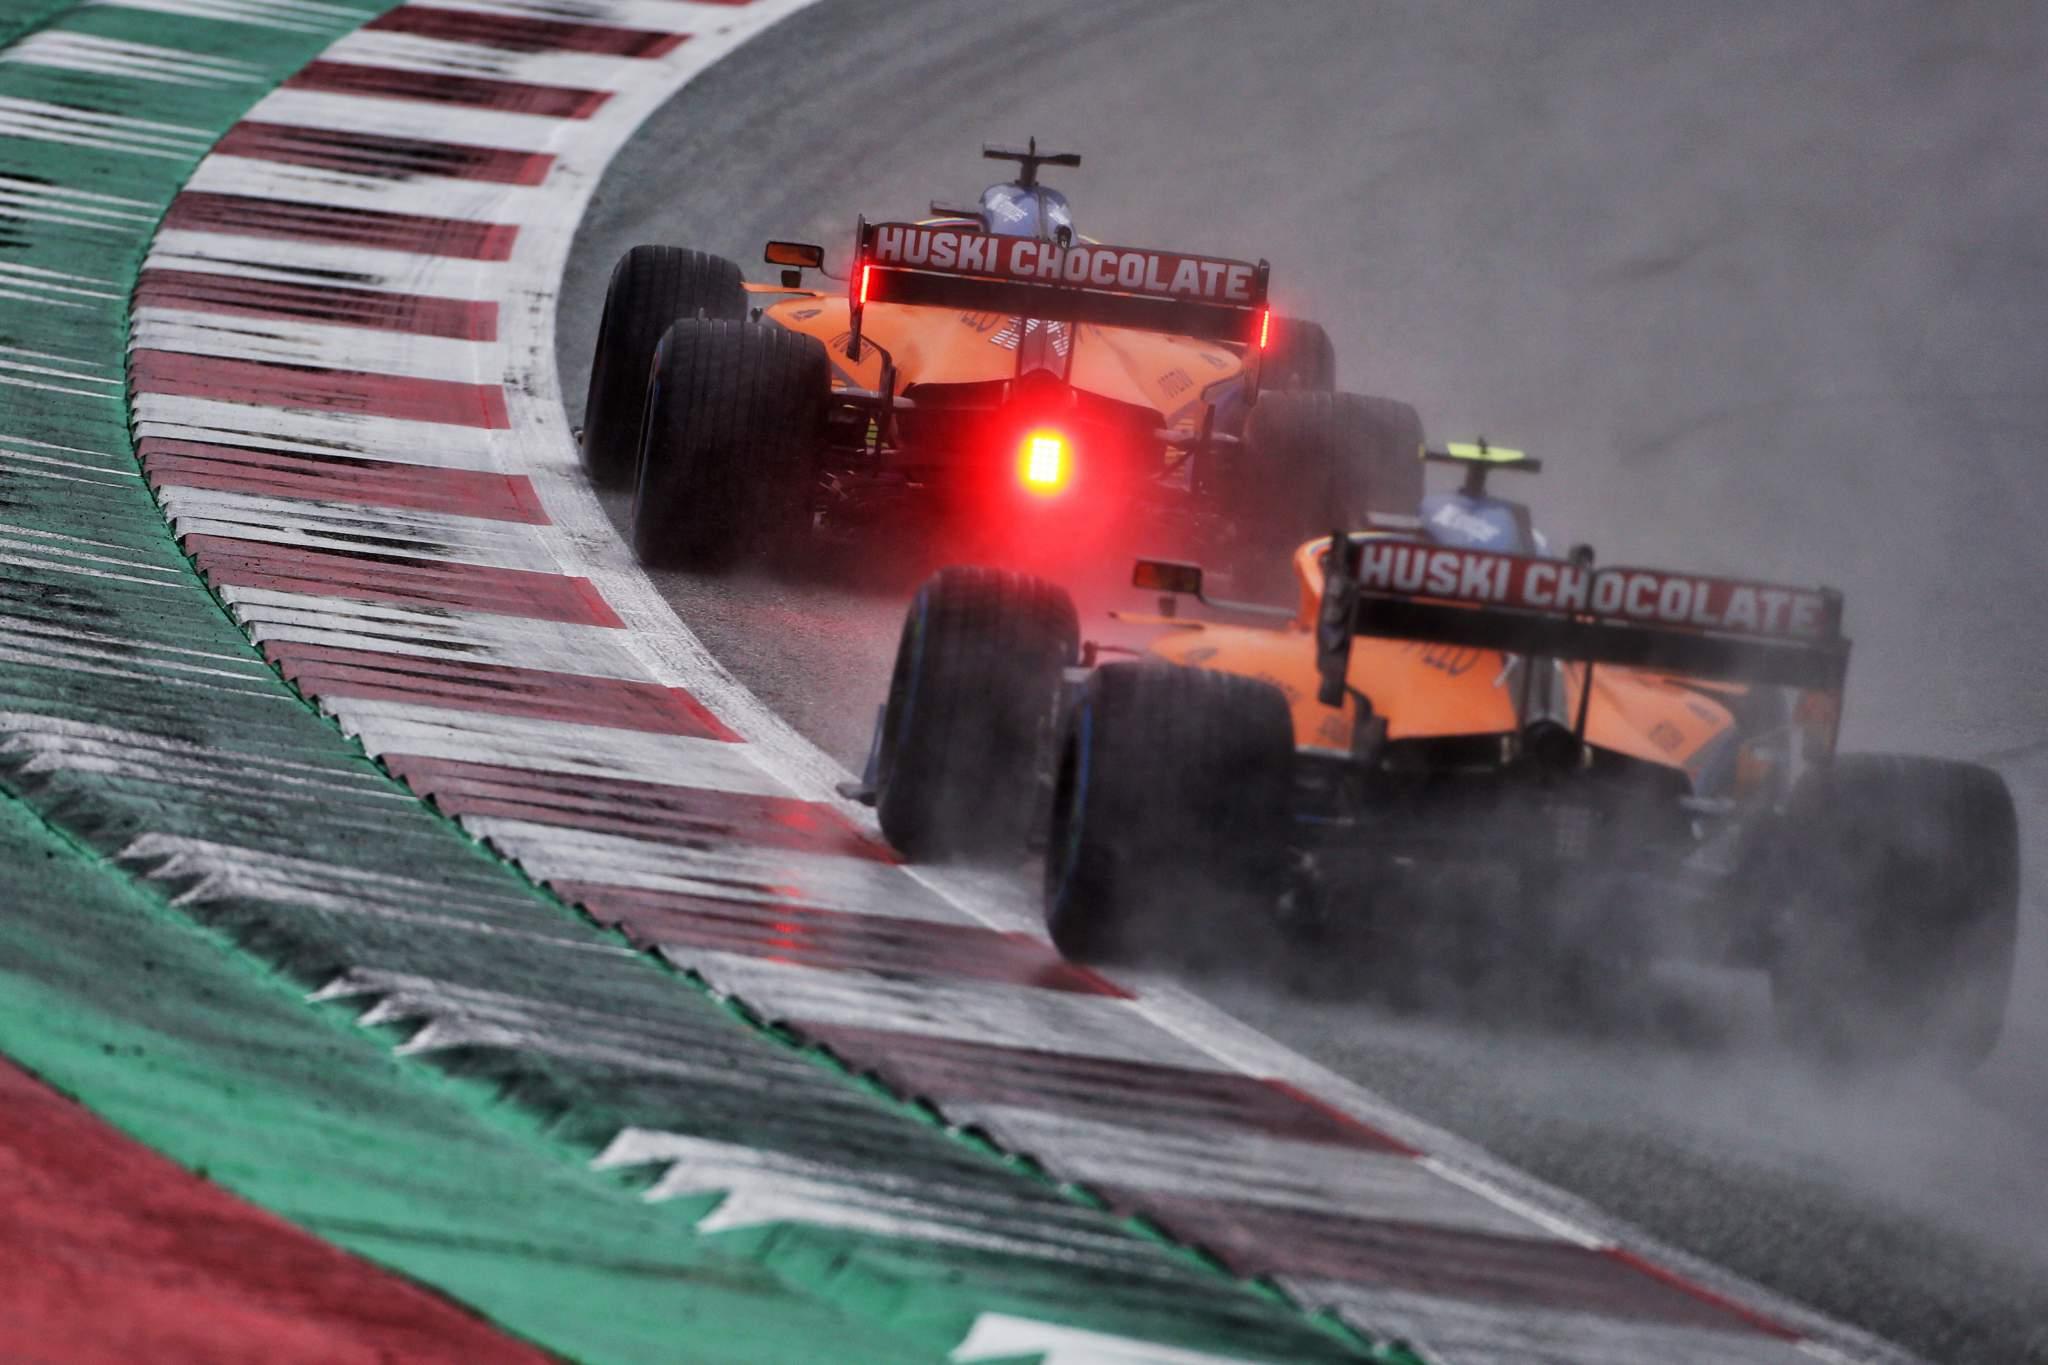 Motor Racing Formula One World Championship Steiermark Grand Prix Qualifying Day Spielberg, Austria